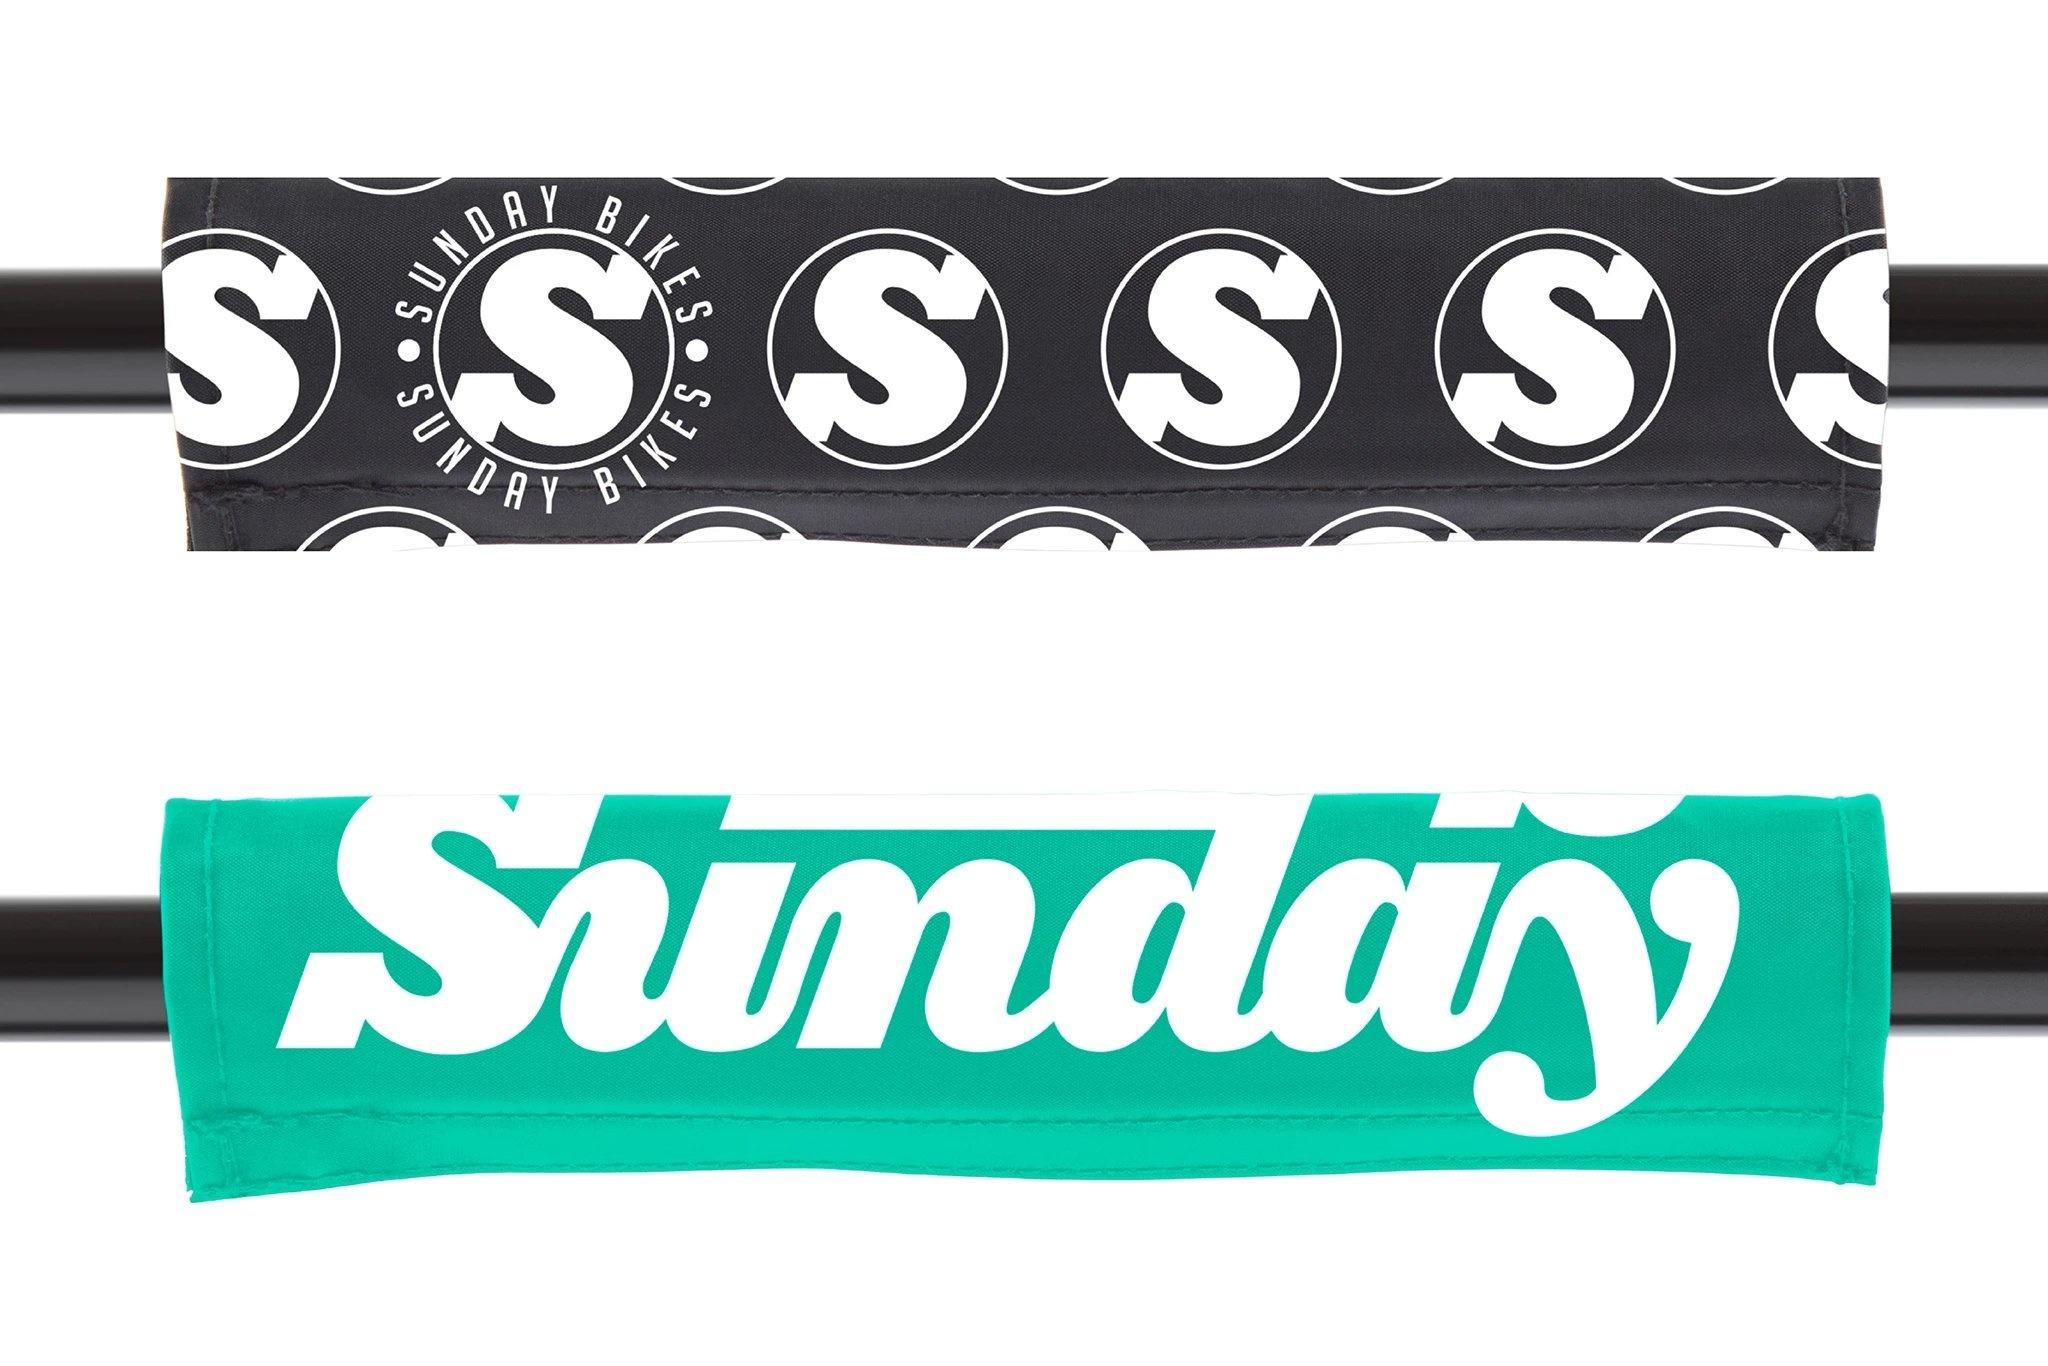 Sunday Reversible Crossbar Pad